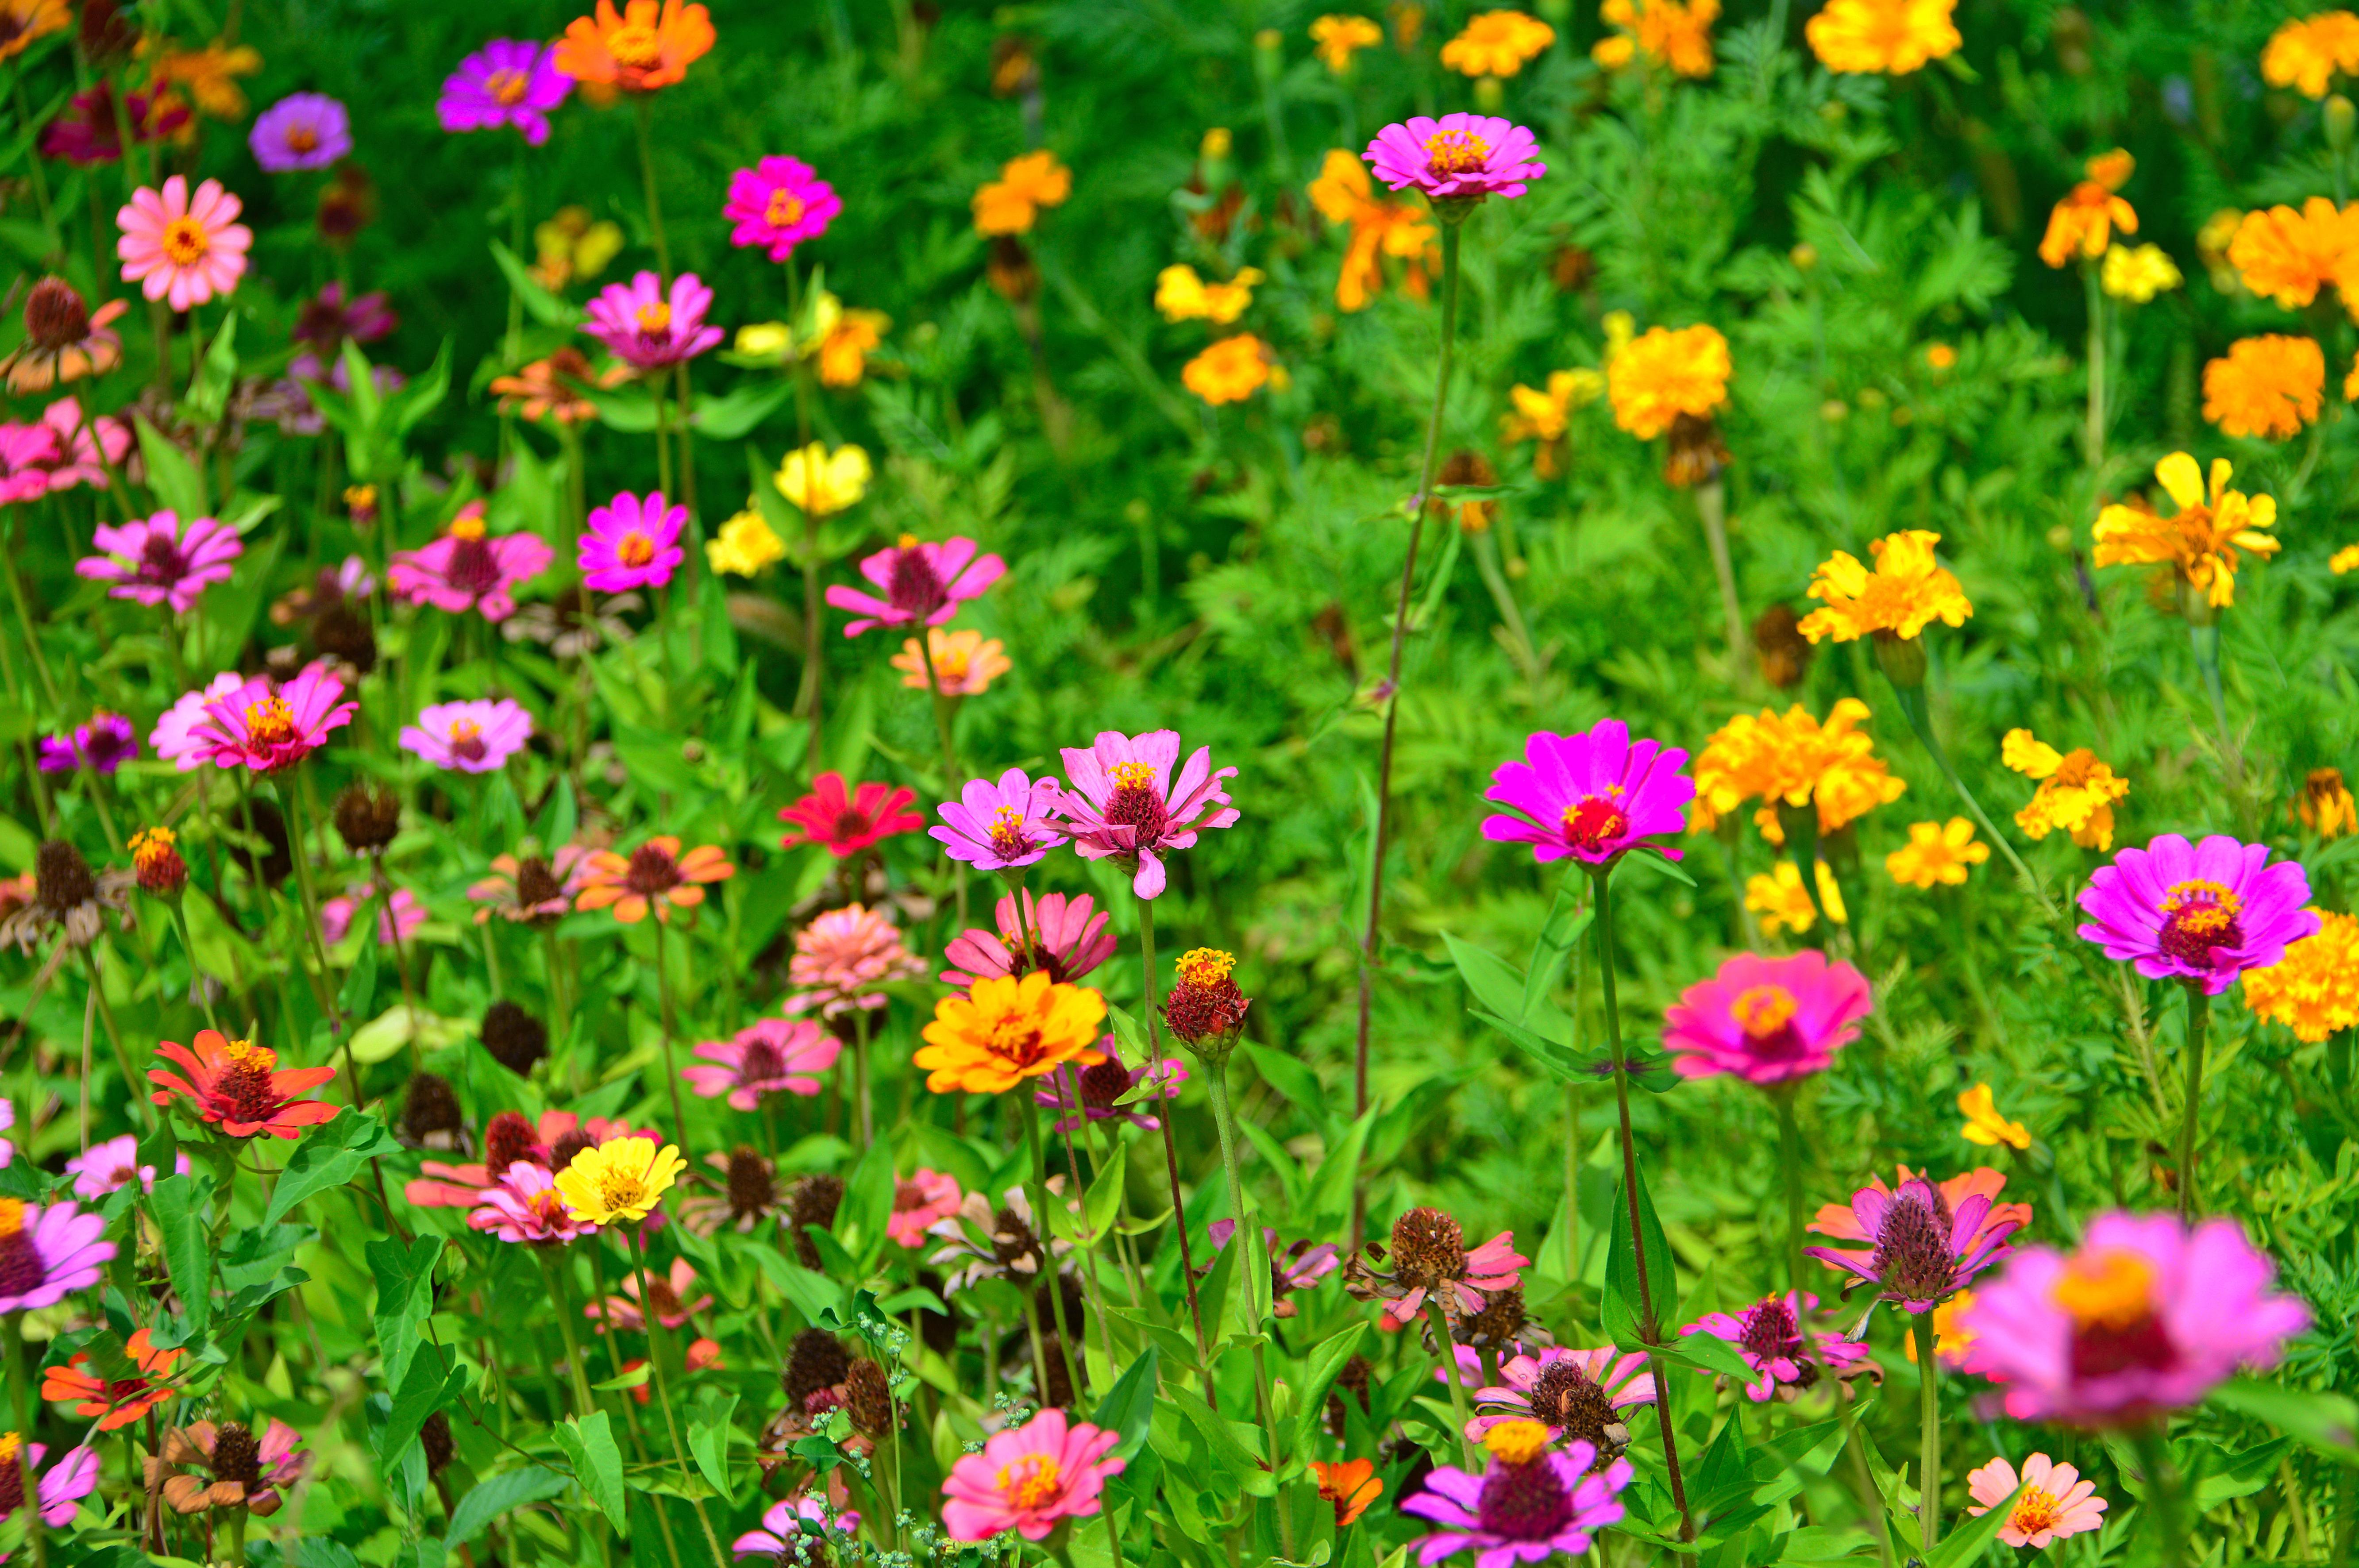 Free Images Flowers Flower Wildflowers Field Meadow Summer